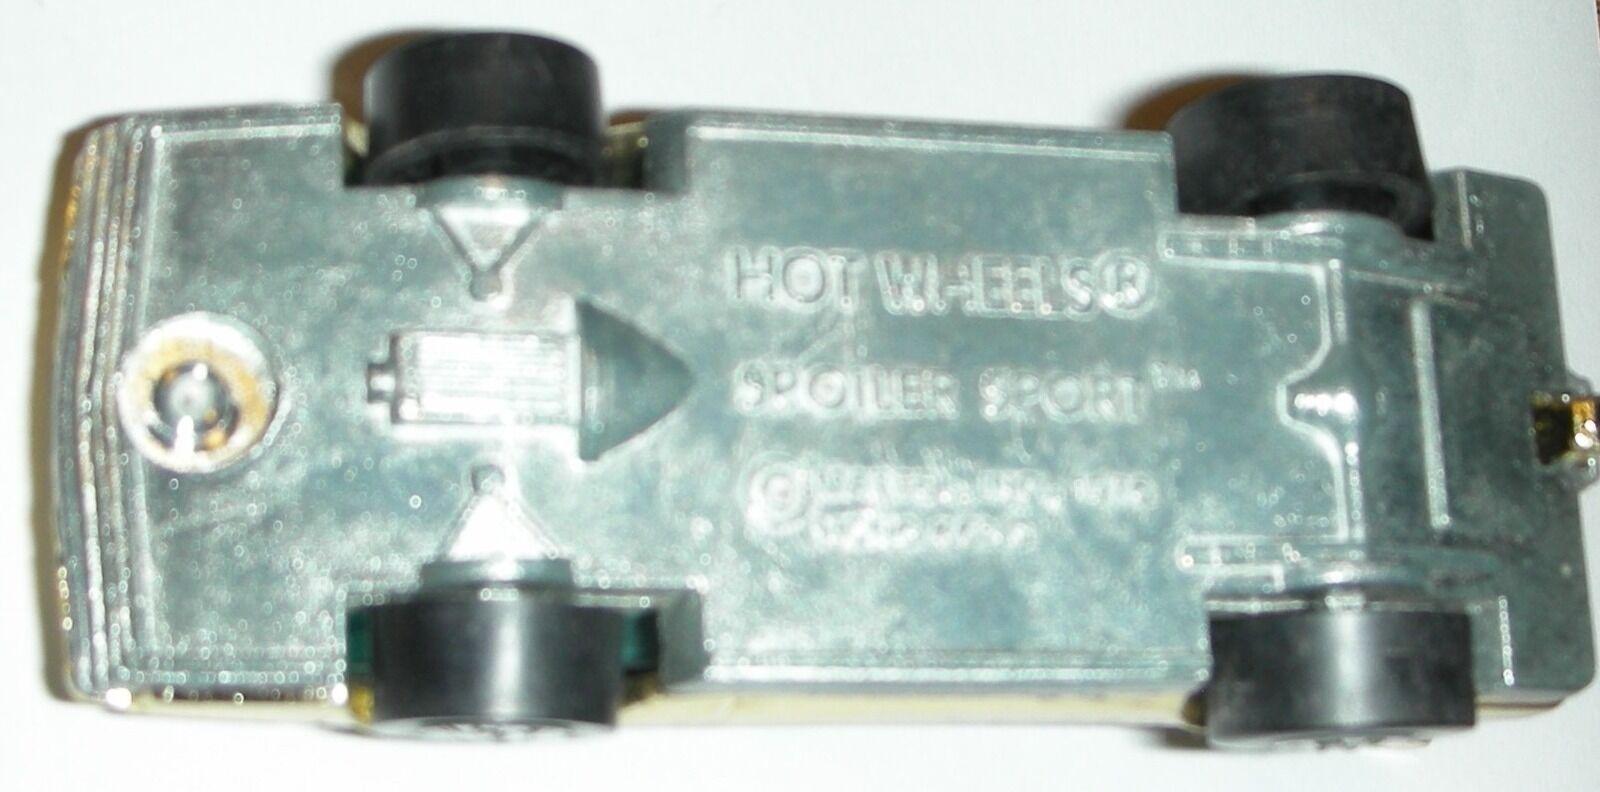 gold Spoiler Sport 1976 Hot Wheels Die-Cast Car Car Car Loose Made in Hong Kong 1 64 7f6681